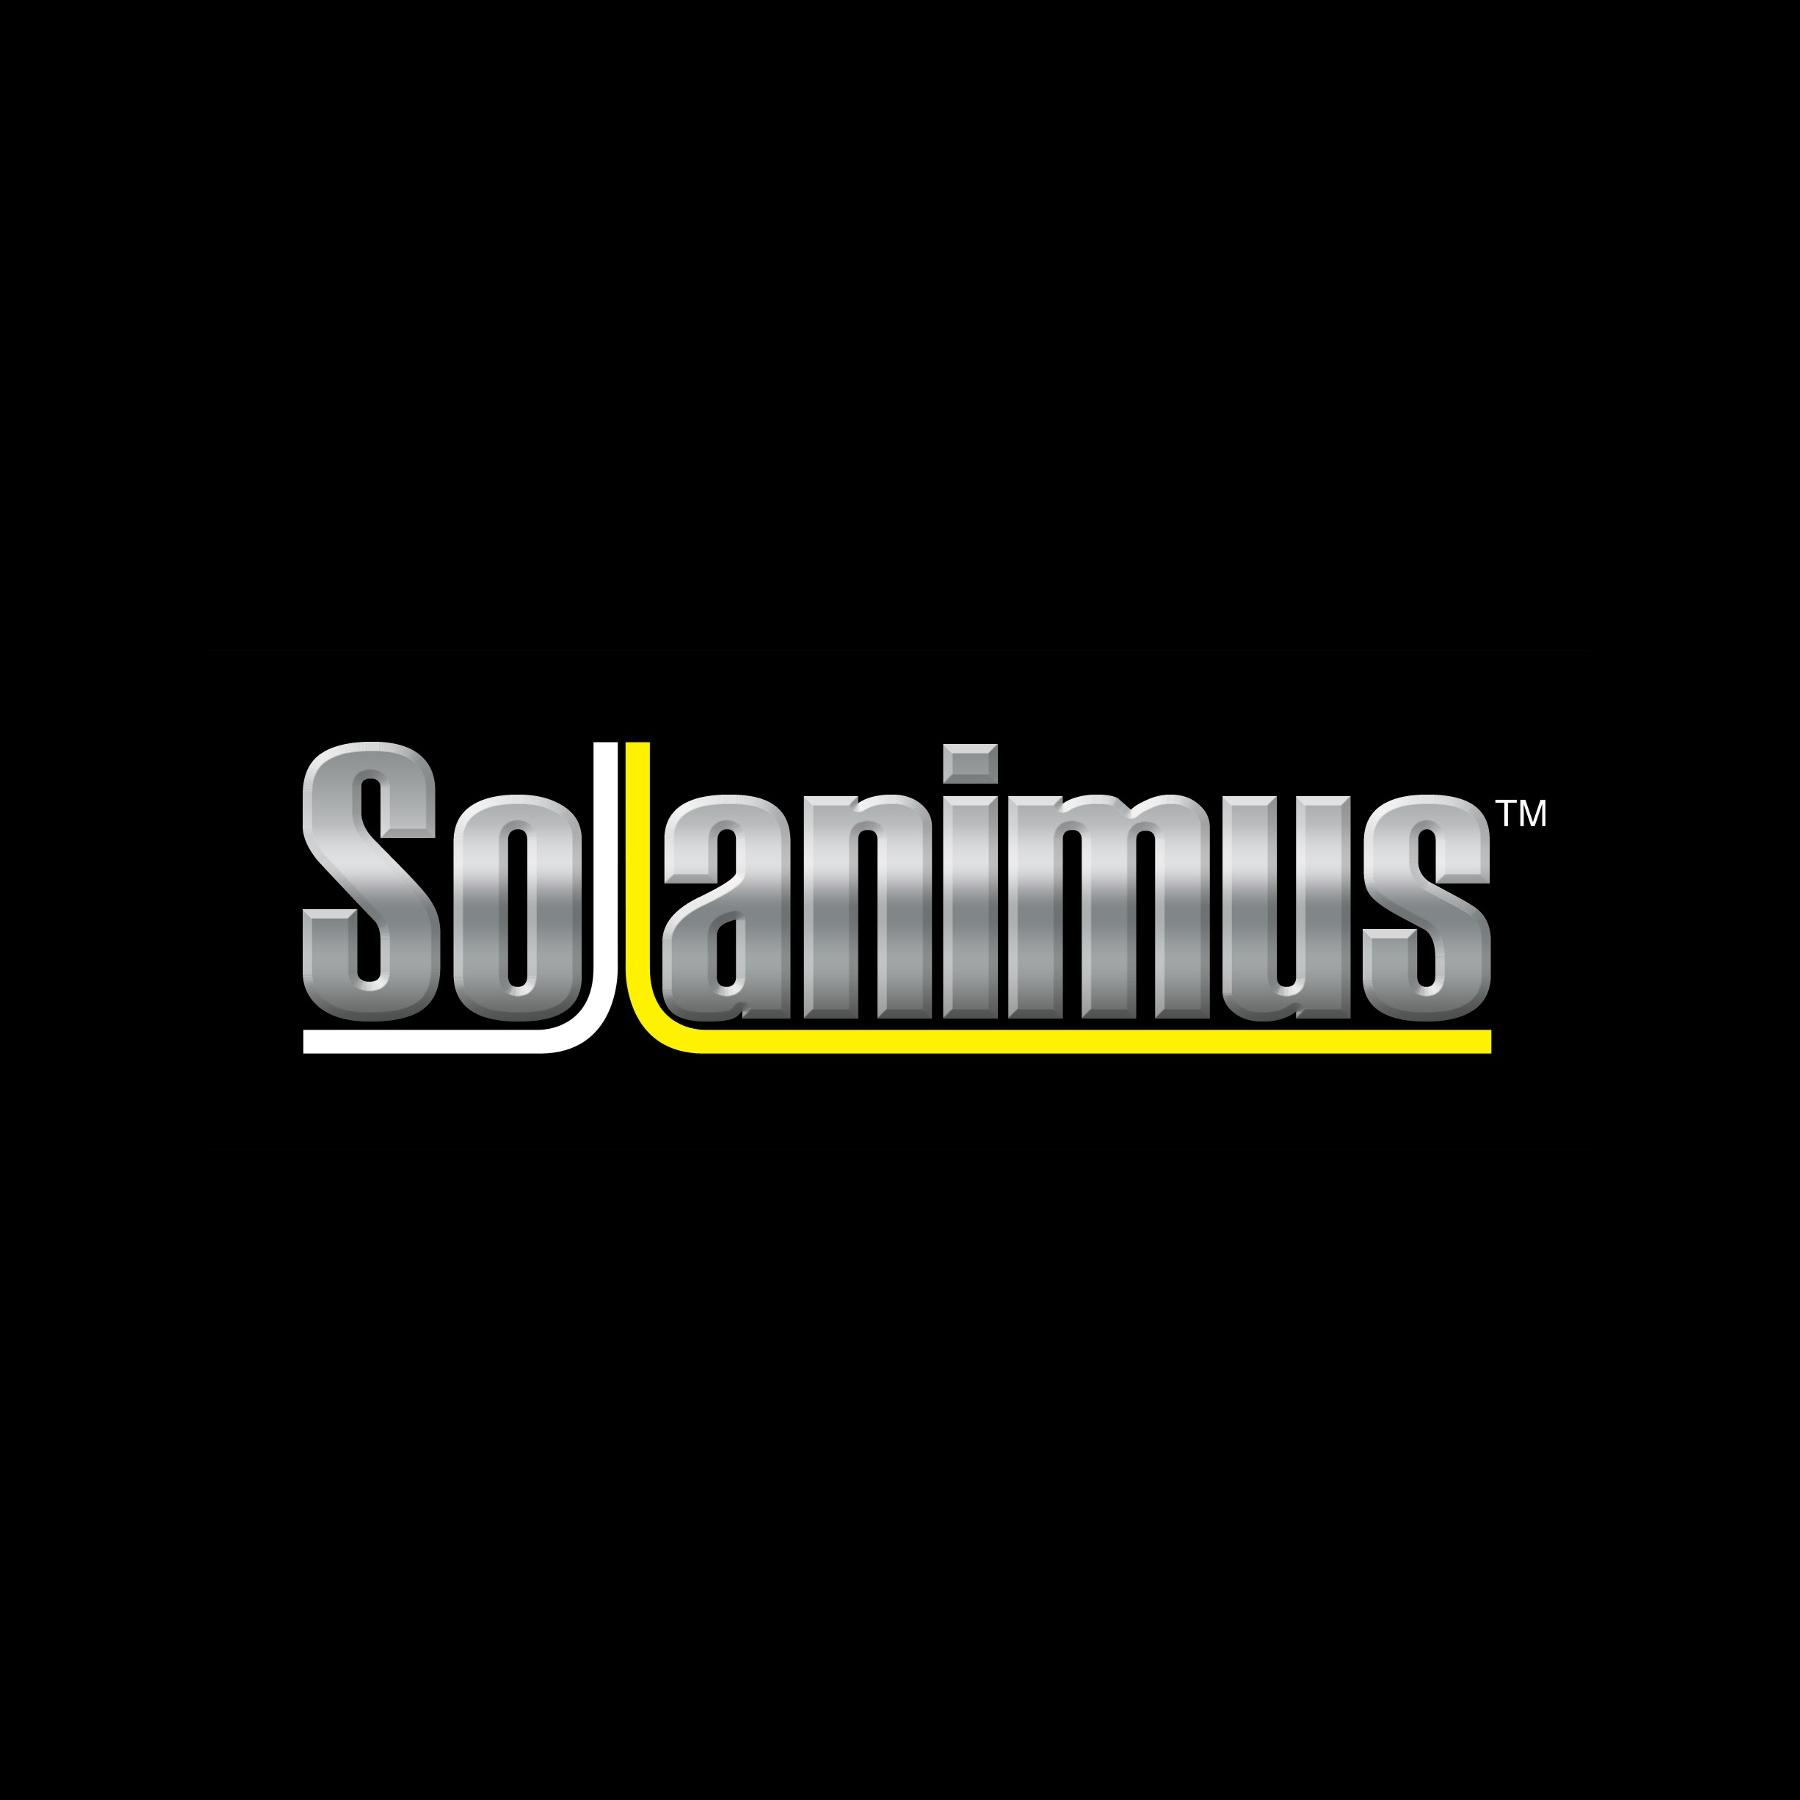 Solanimus_Color SQ SM